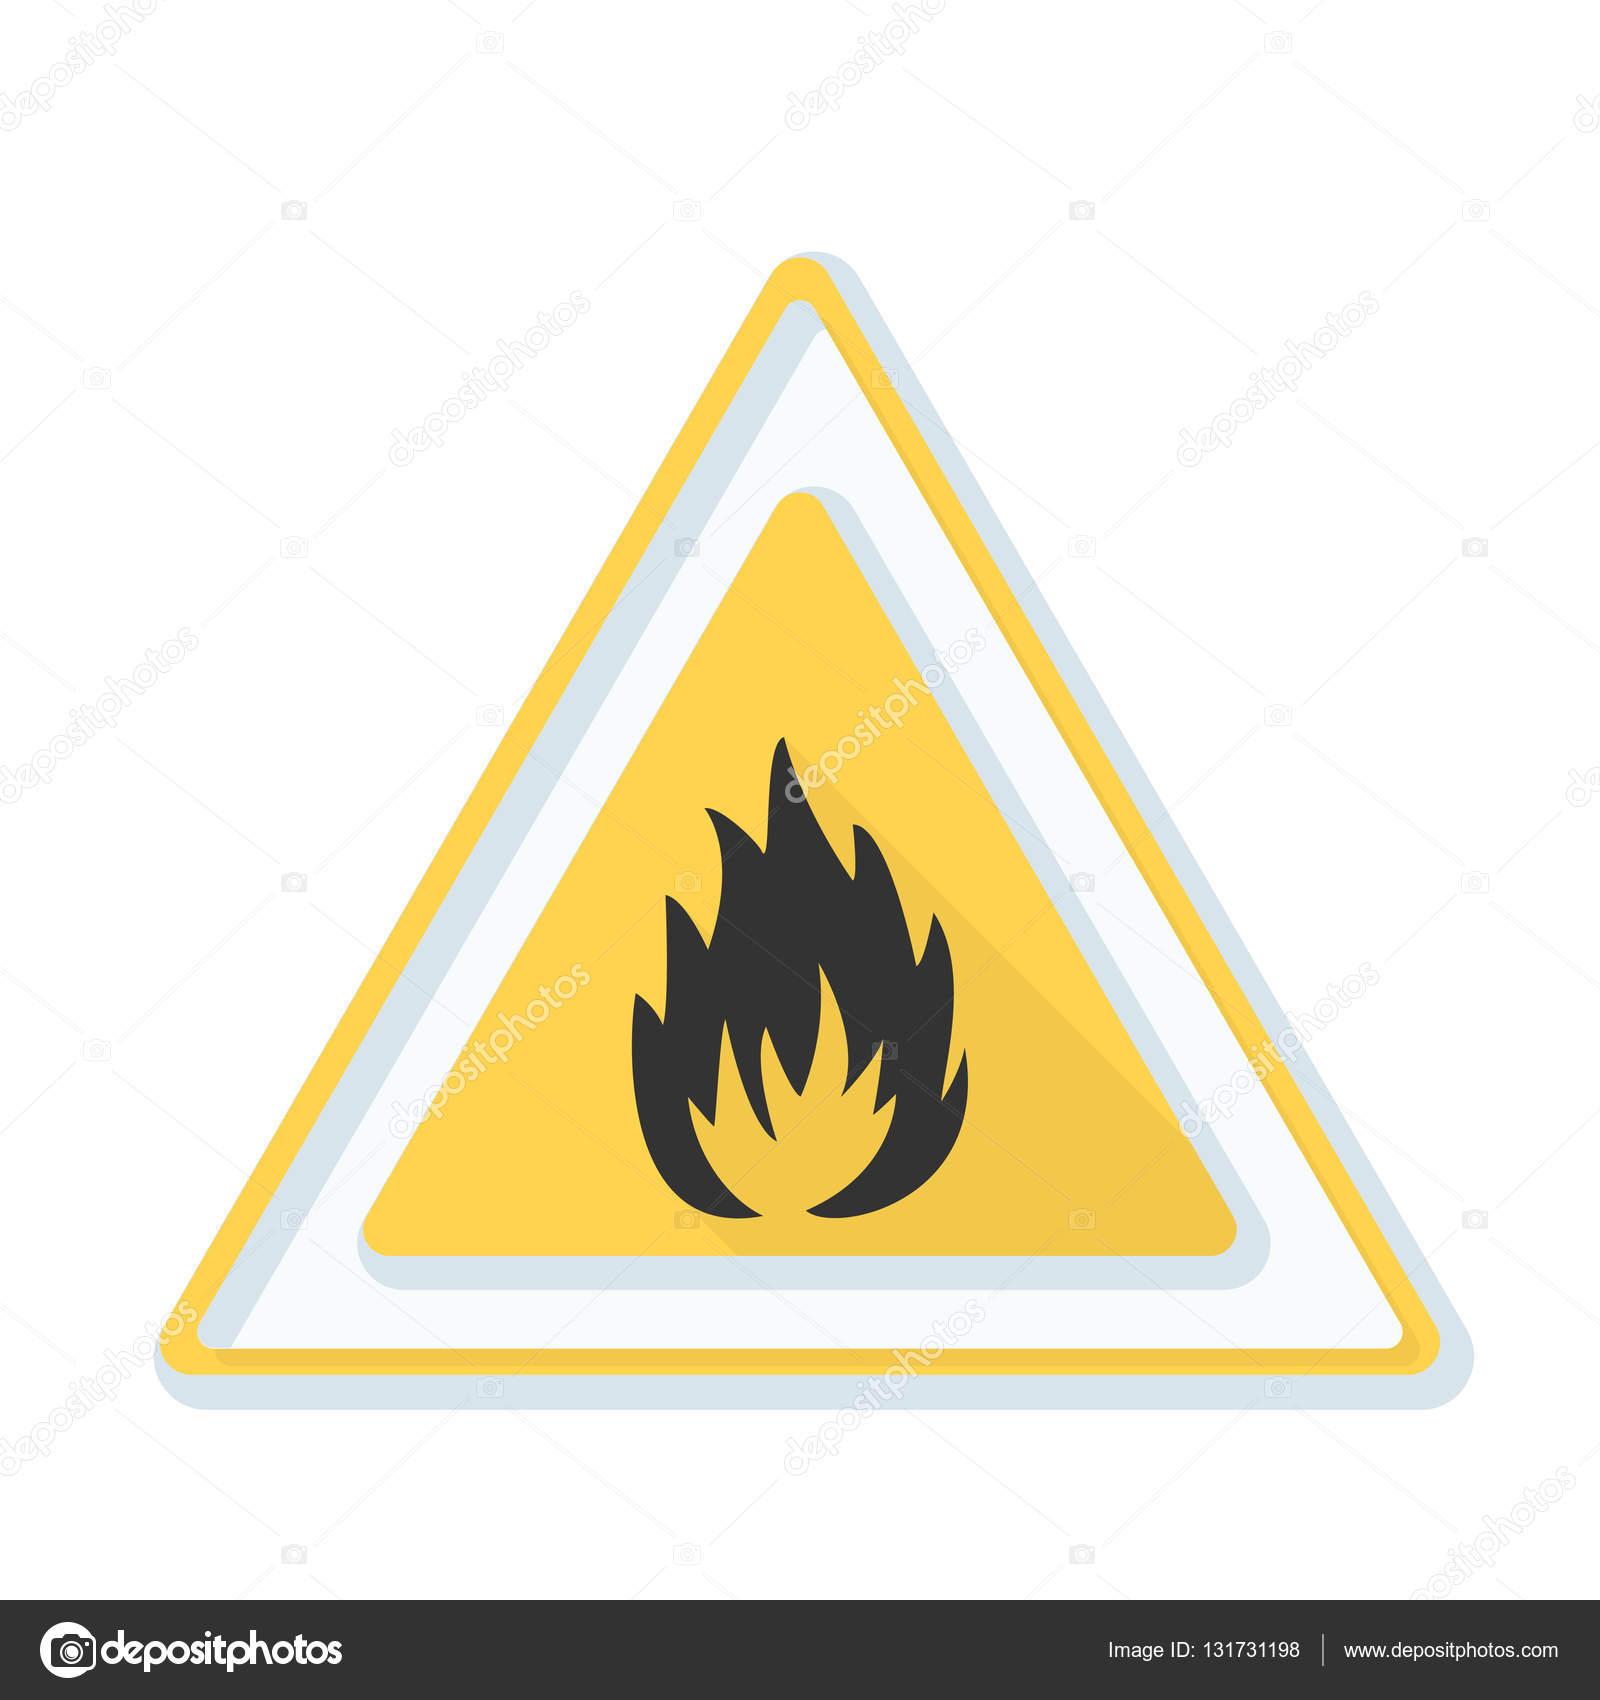 Flammable danger sign stock vector yuriyvlasenko 131731198 flammable danger sign stock vector buycottarizona